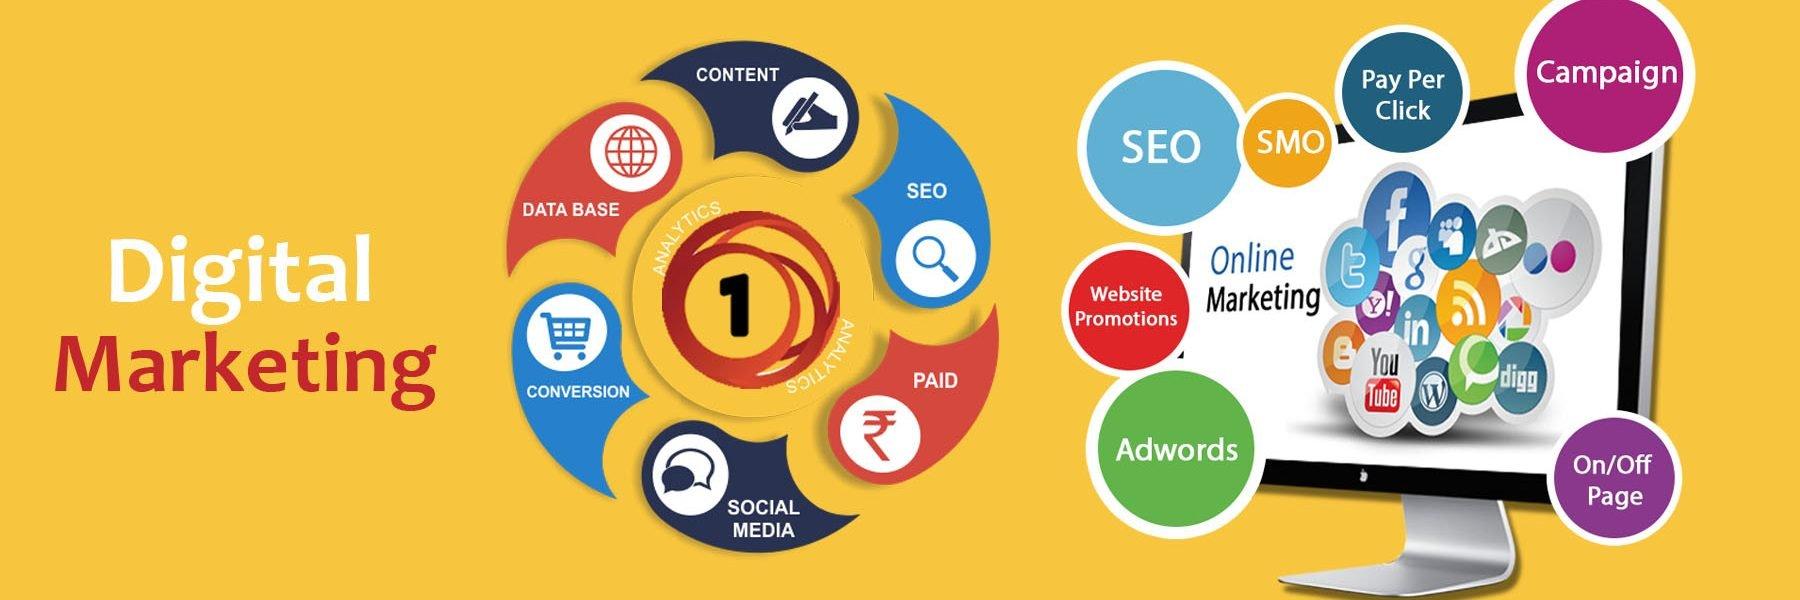 1technologies online marketing company in delhi Digital Marketing digital marketing 1800x600